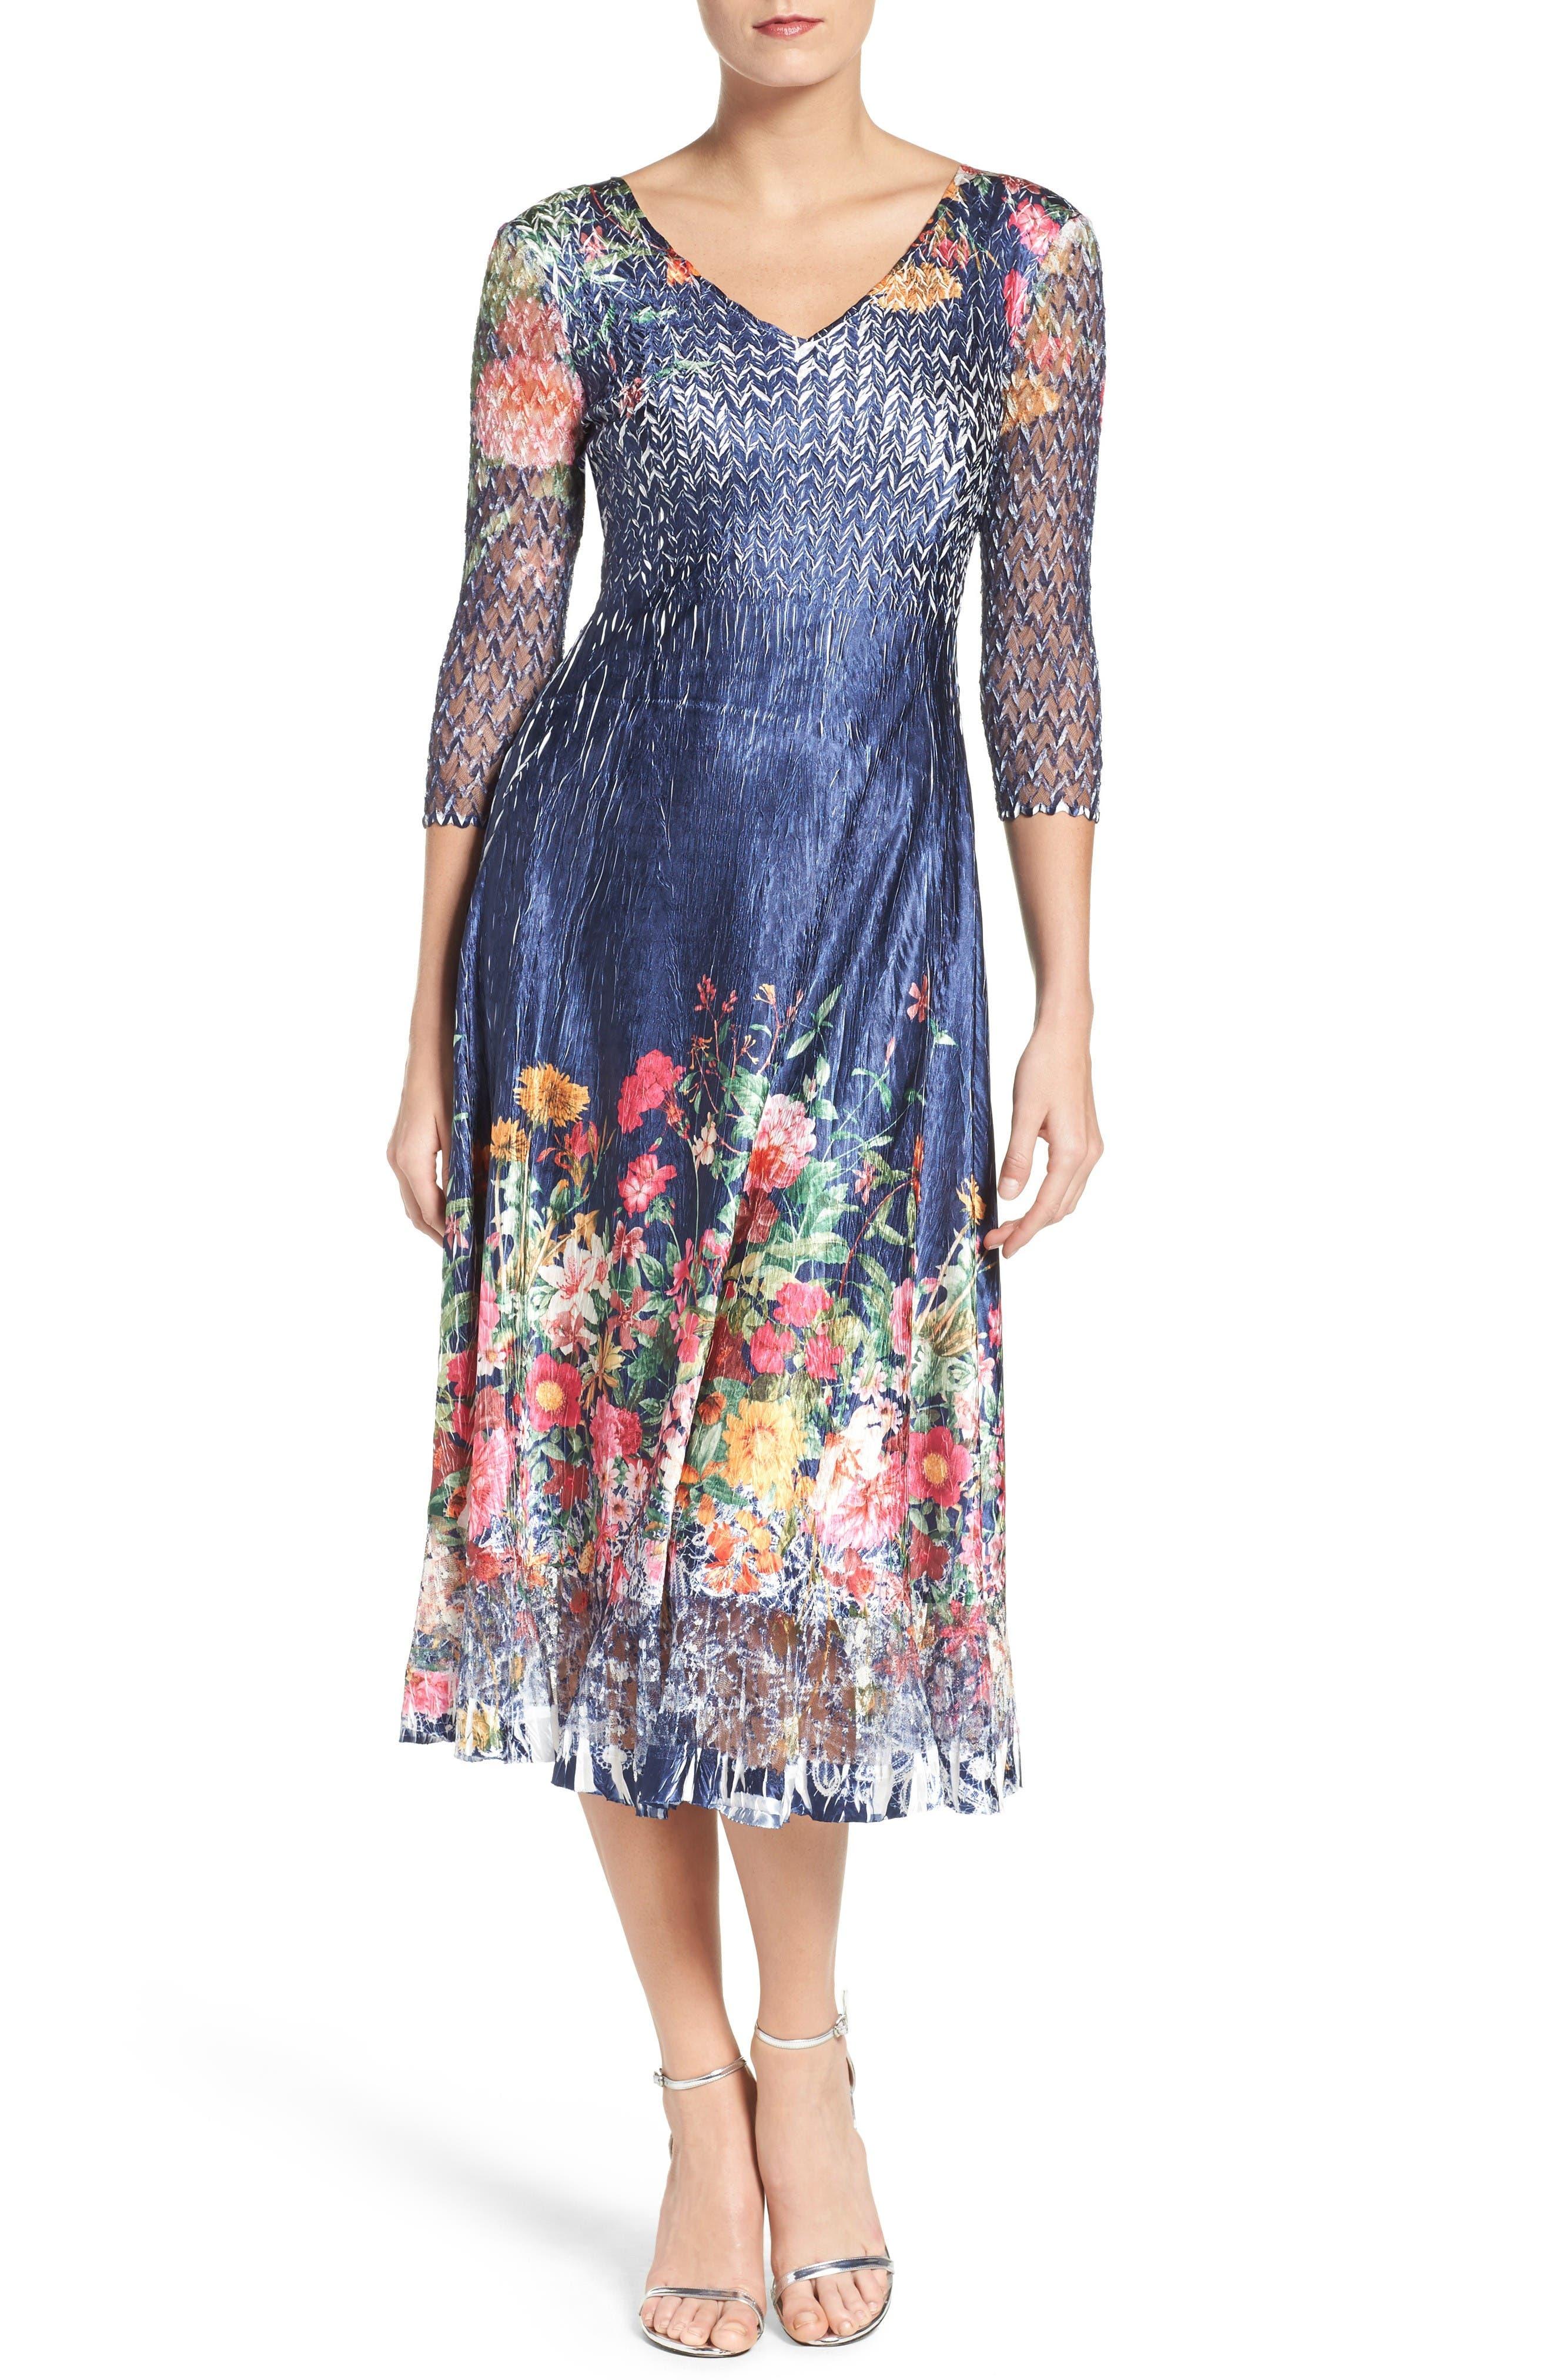 Alternate Image 1 Selected - Komarov Floral Print A-Line Dress